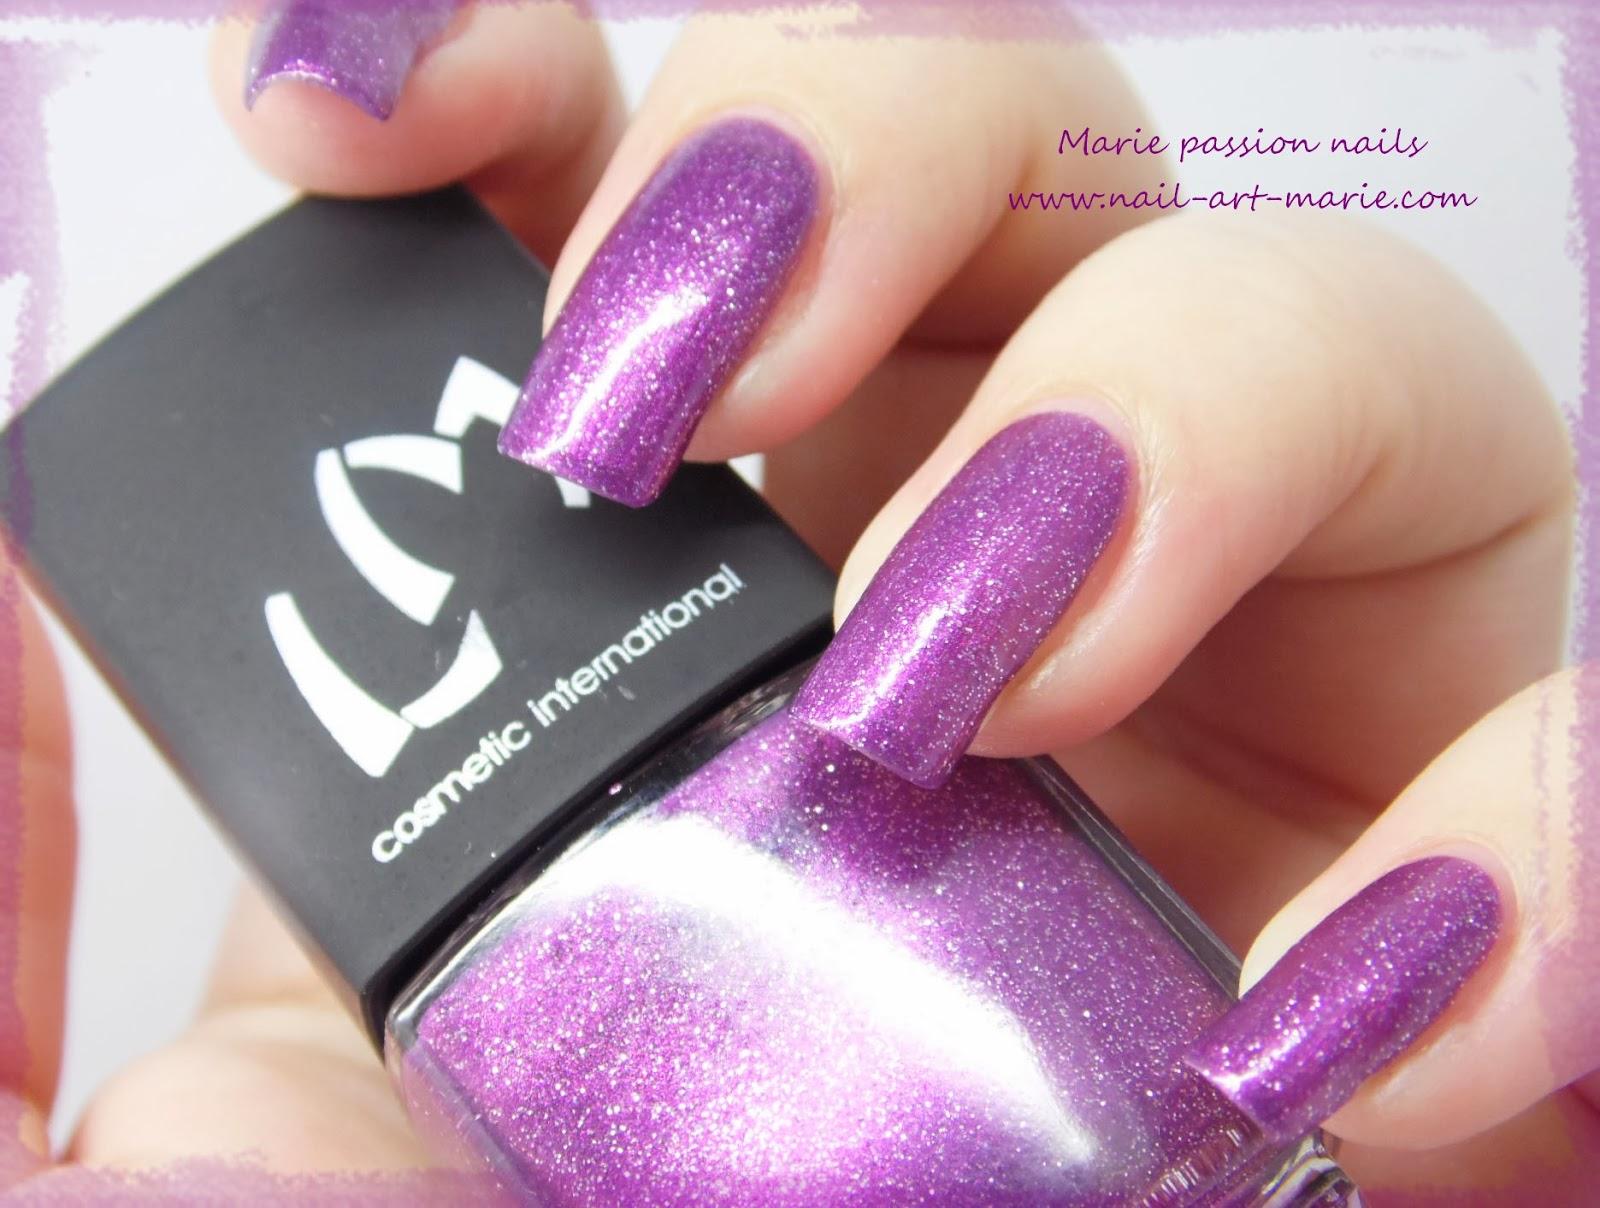 LM Cosmetic Moretta5